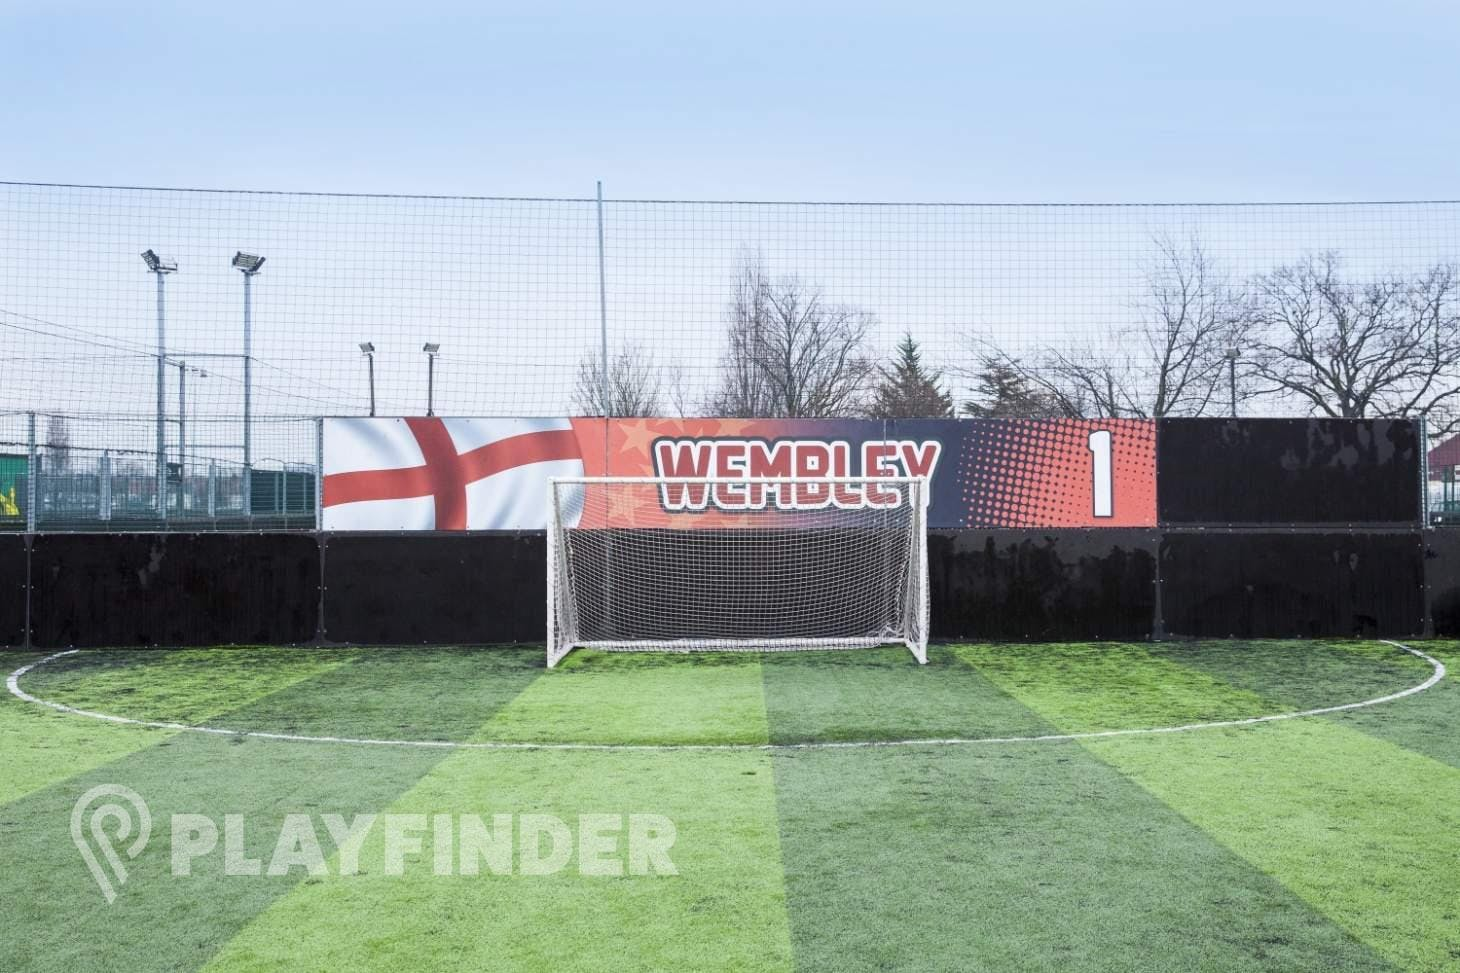 Goals Wembley 5 a side | 3G Astroturf football pitch